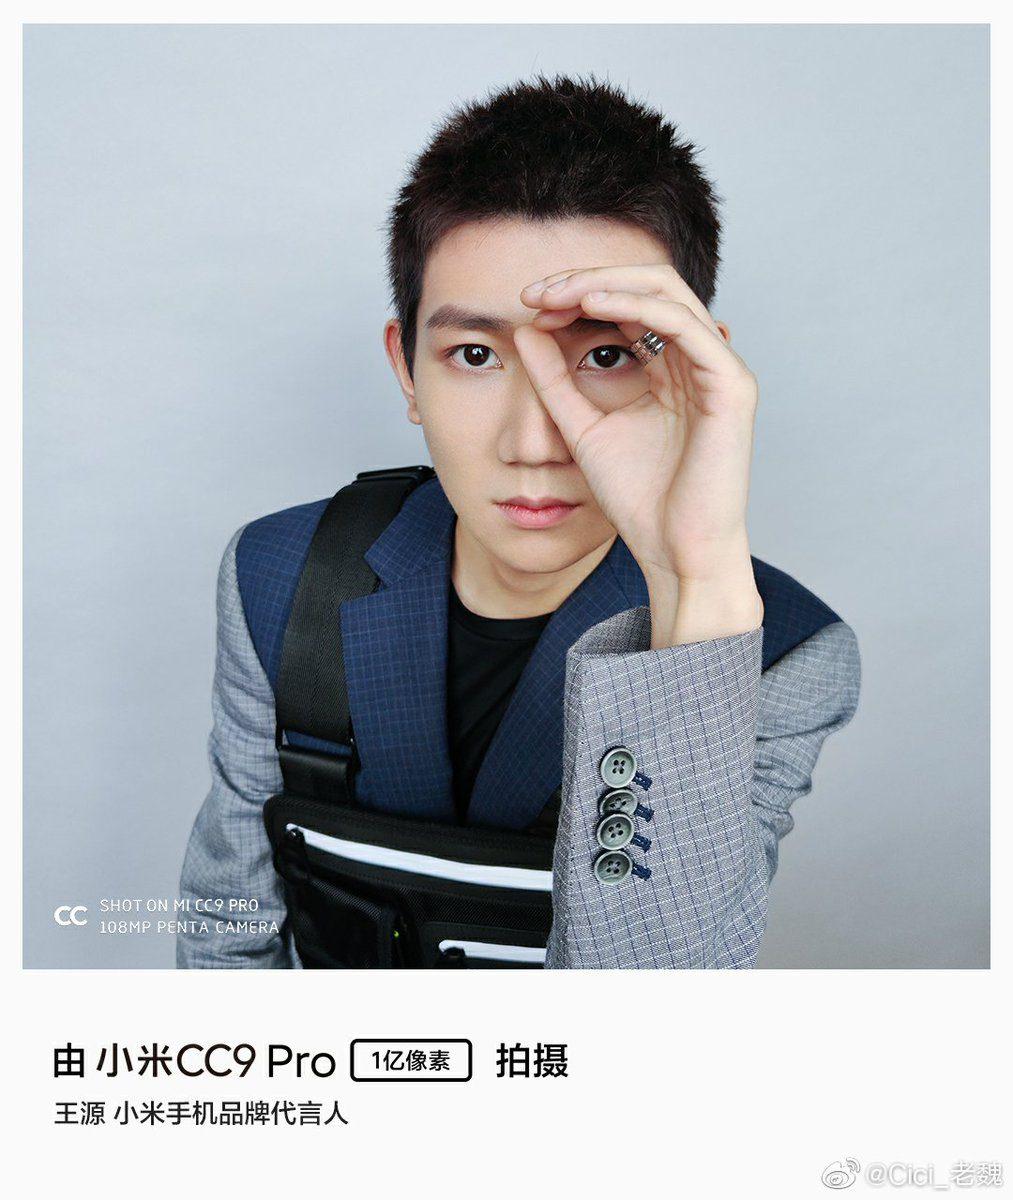 Фотография на CC9 Pro